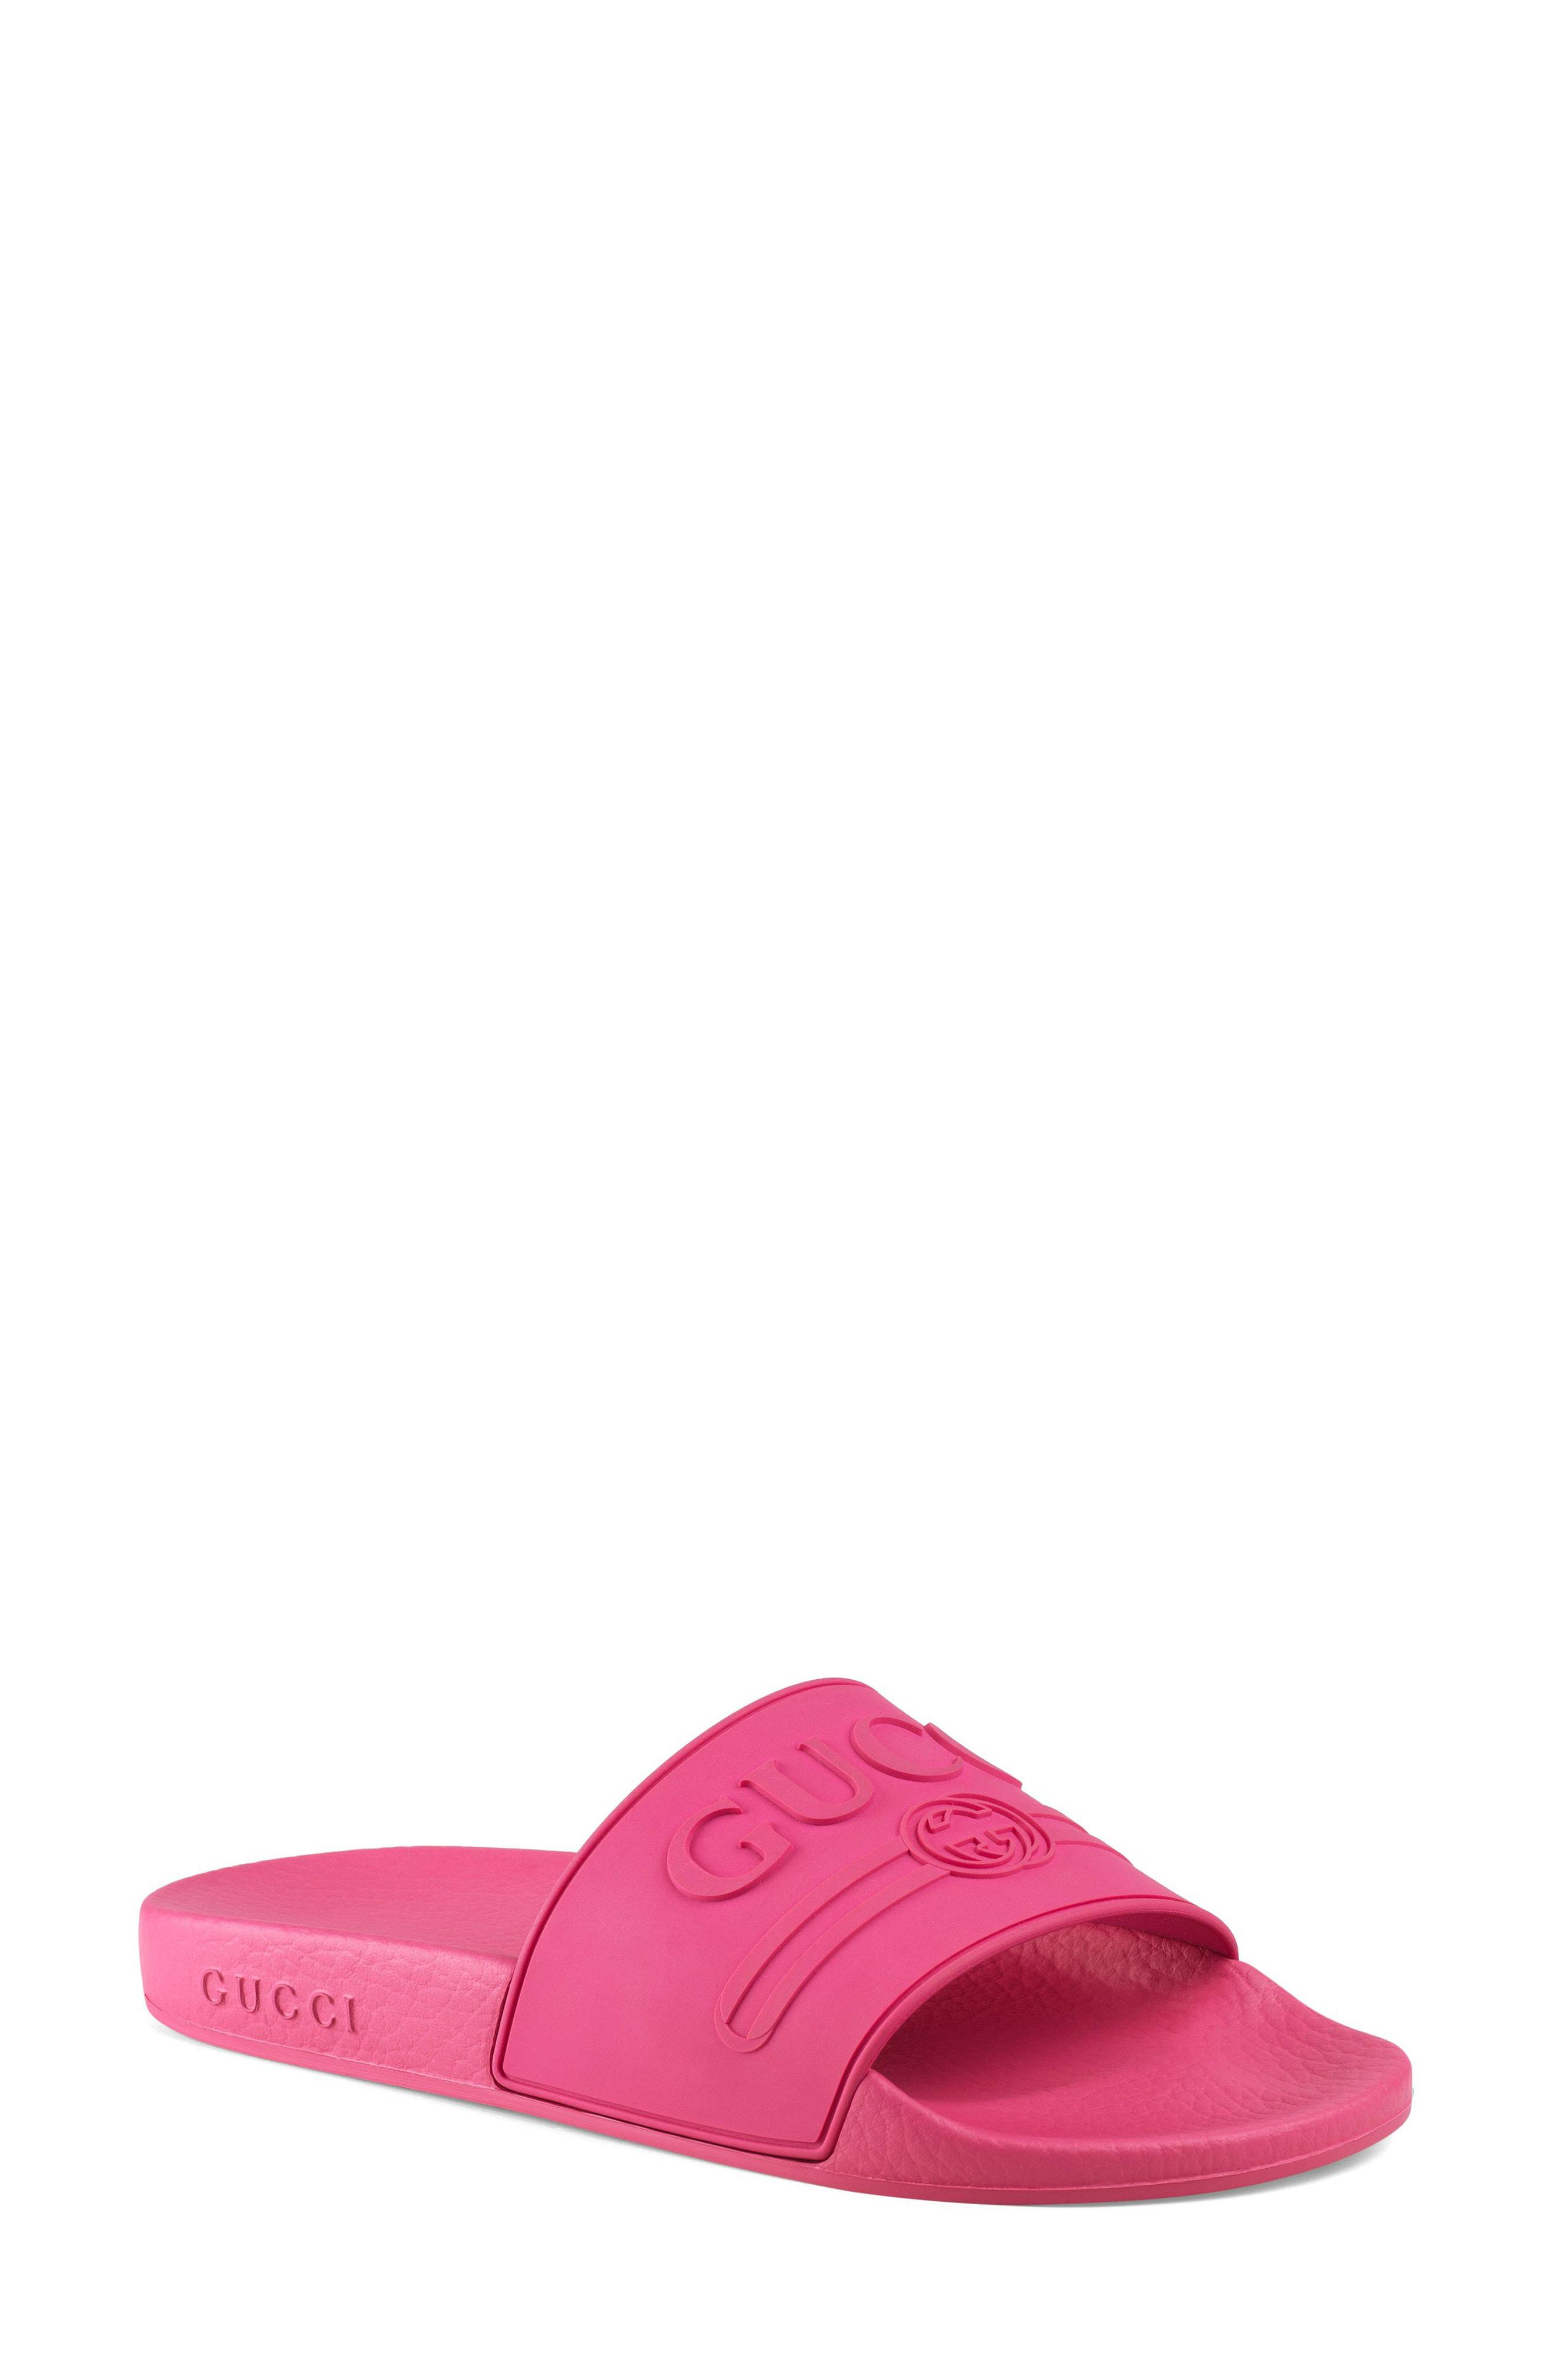 672a39d388be7f Gucci - Pink Pursuit Logo Slide Sandal - Lyst. View fullscreen